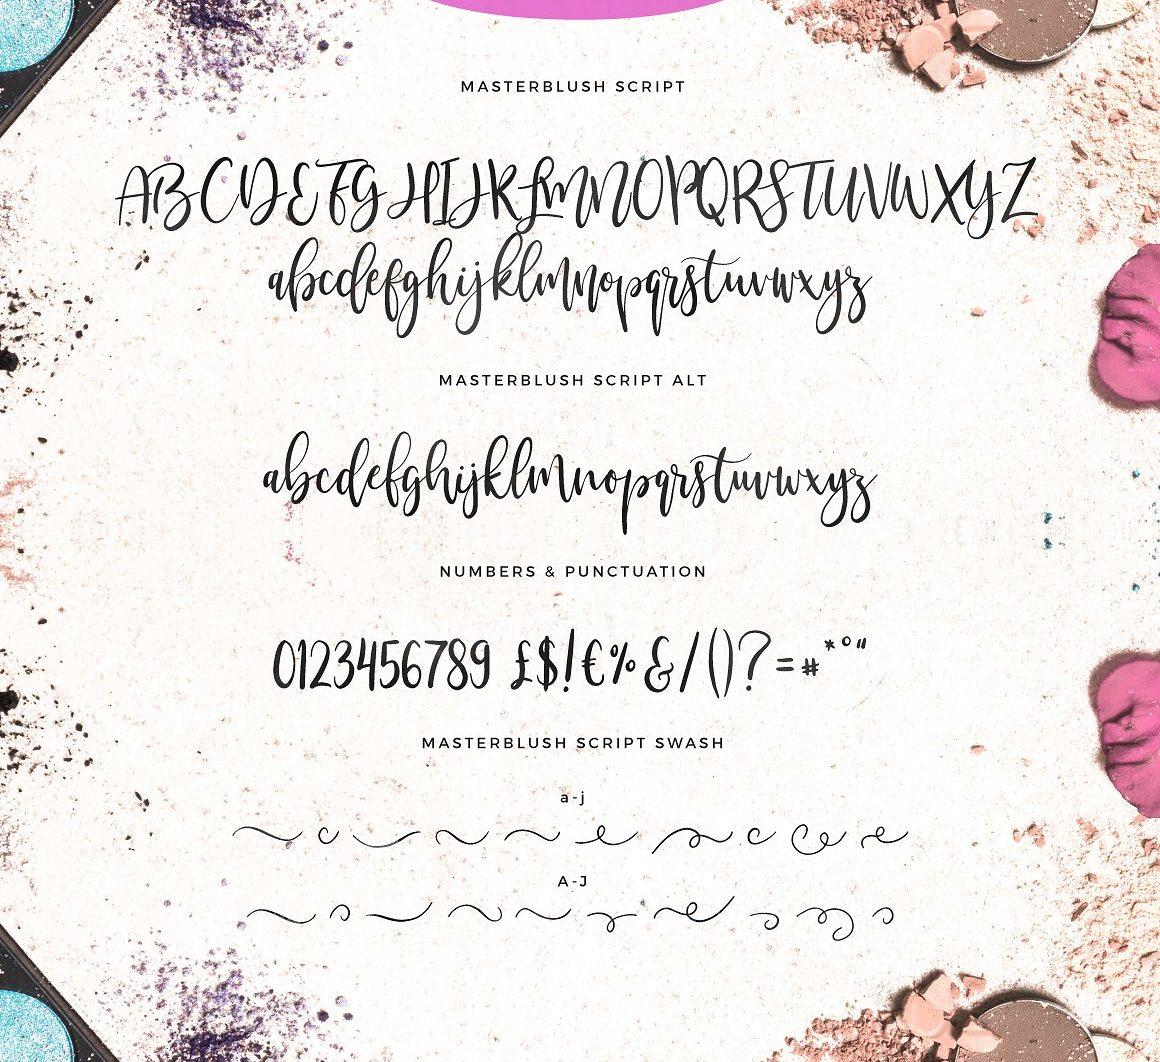 Masterblush Font - masterblush brush script font 9 5 -